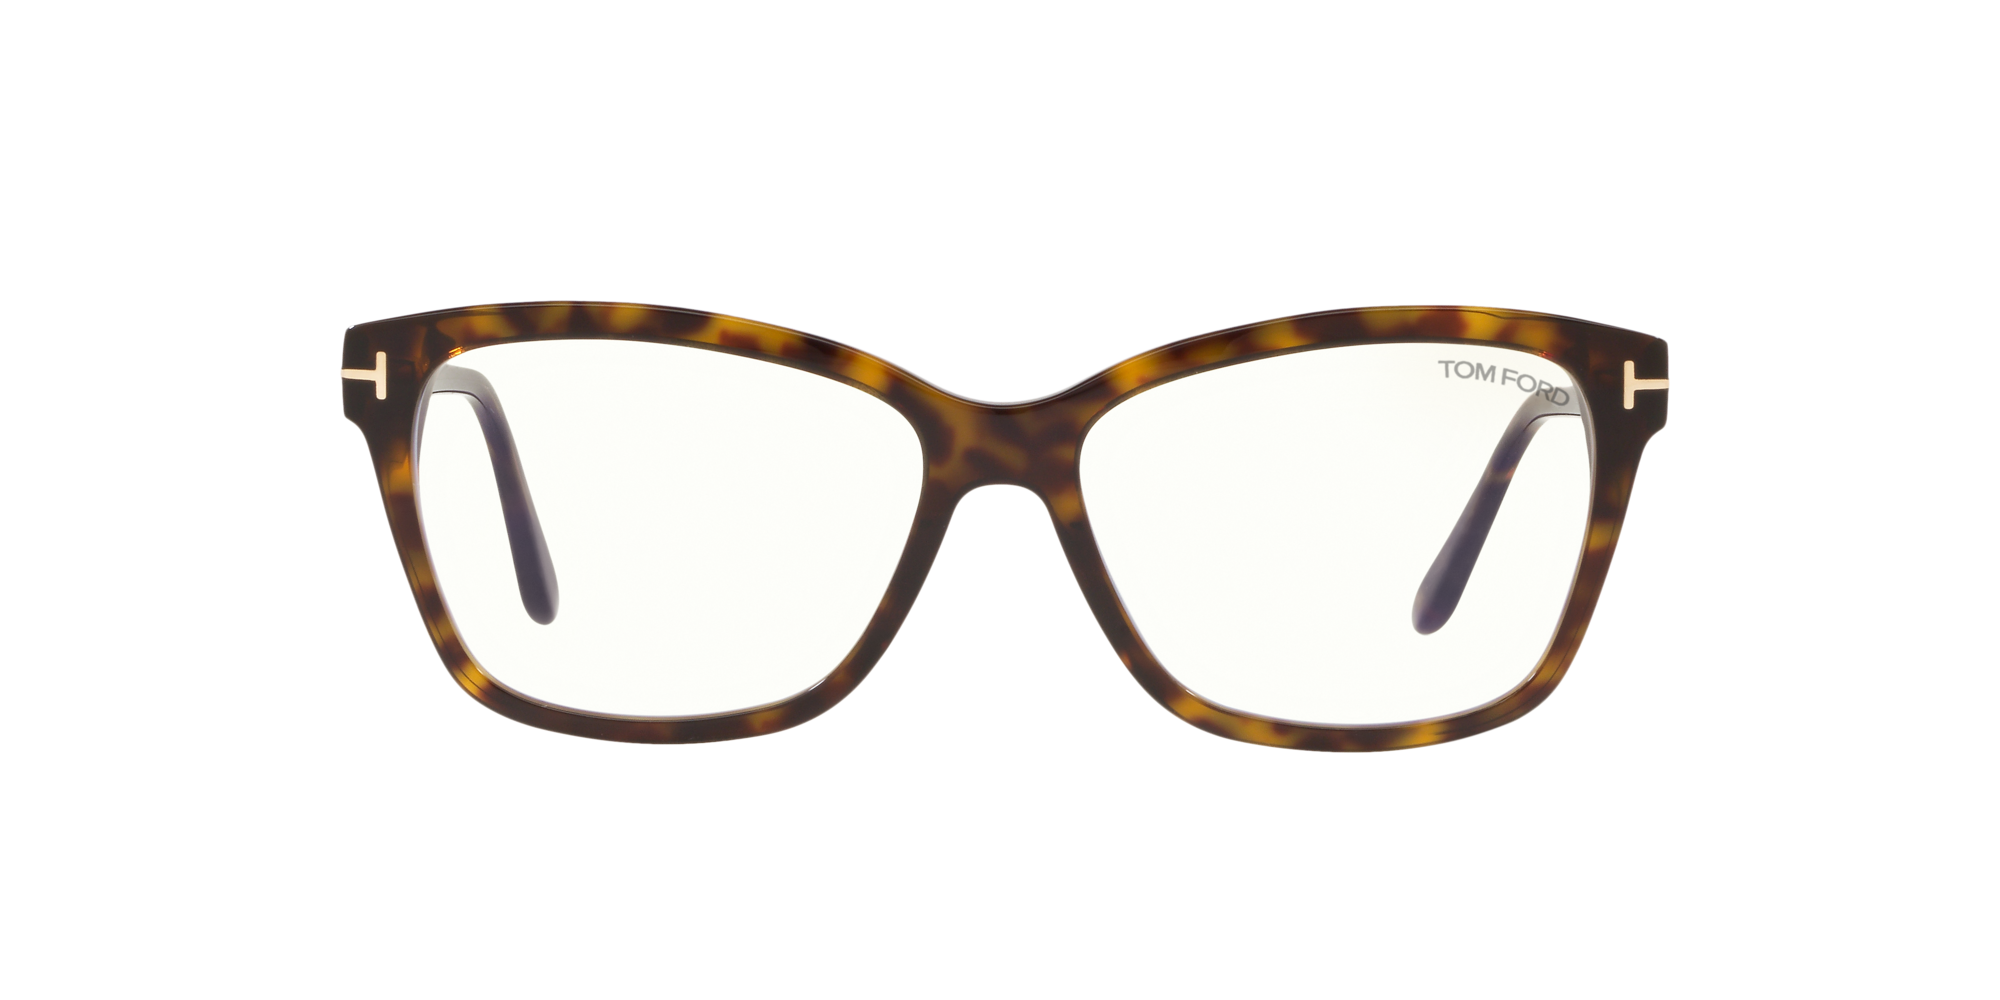 Image for FT5597-B from LensCrafters | Glasses, Prescription Glasses Online, Eyewear